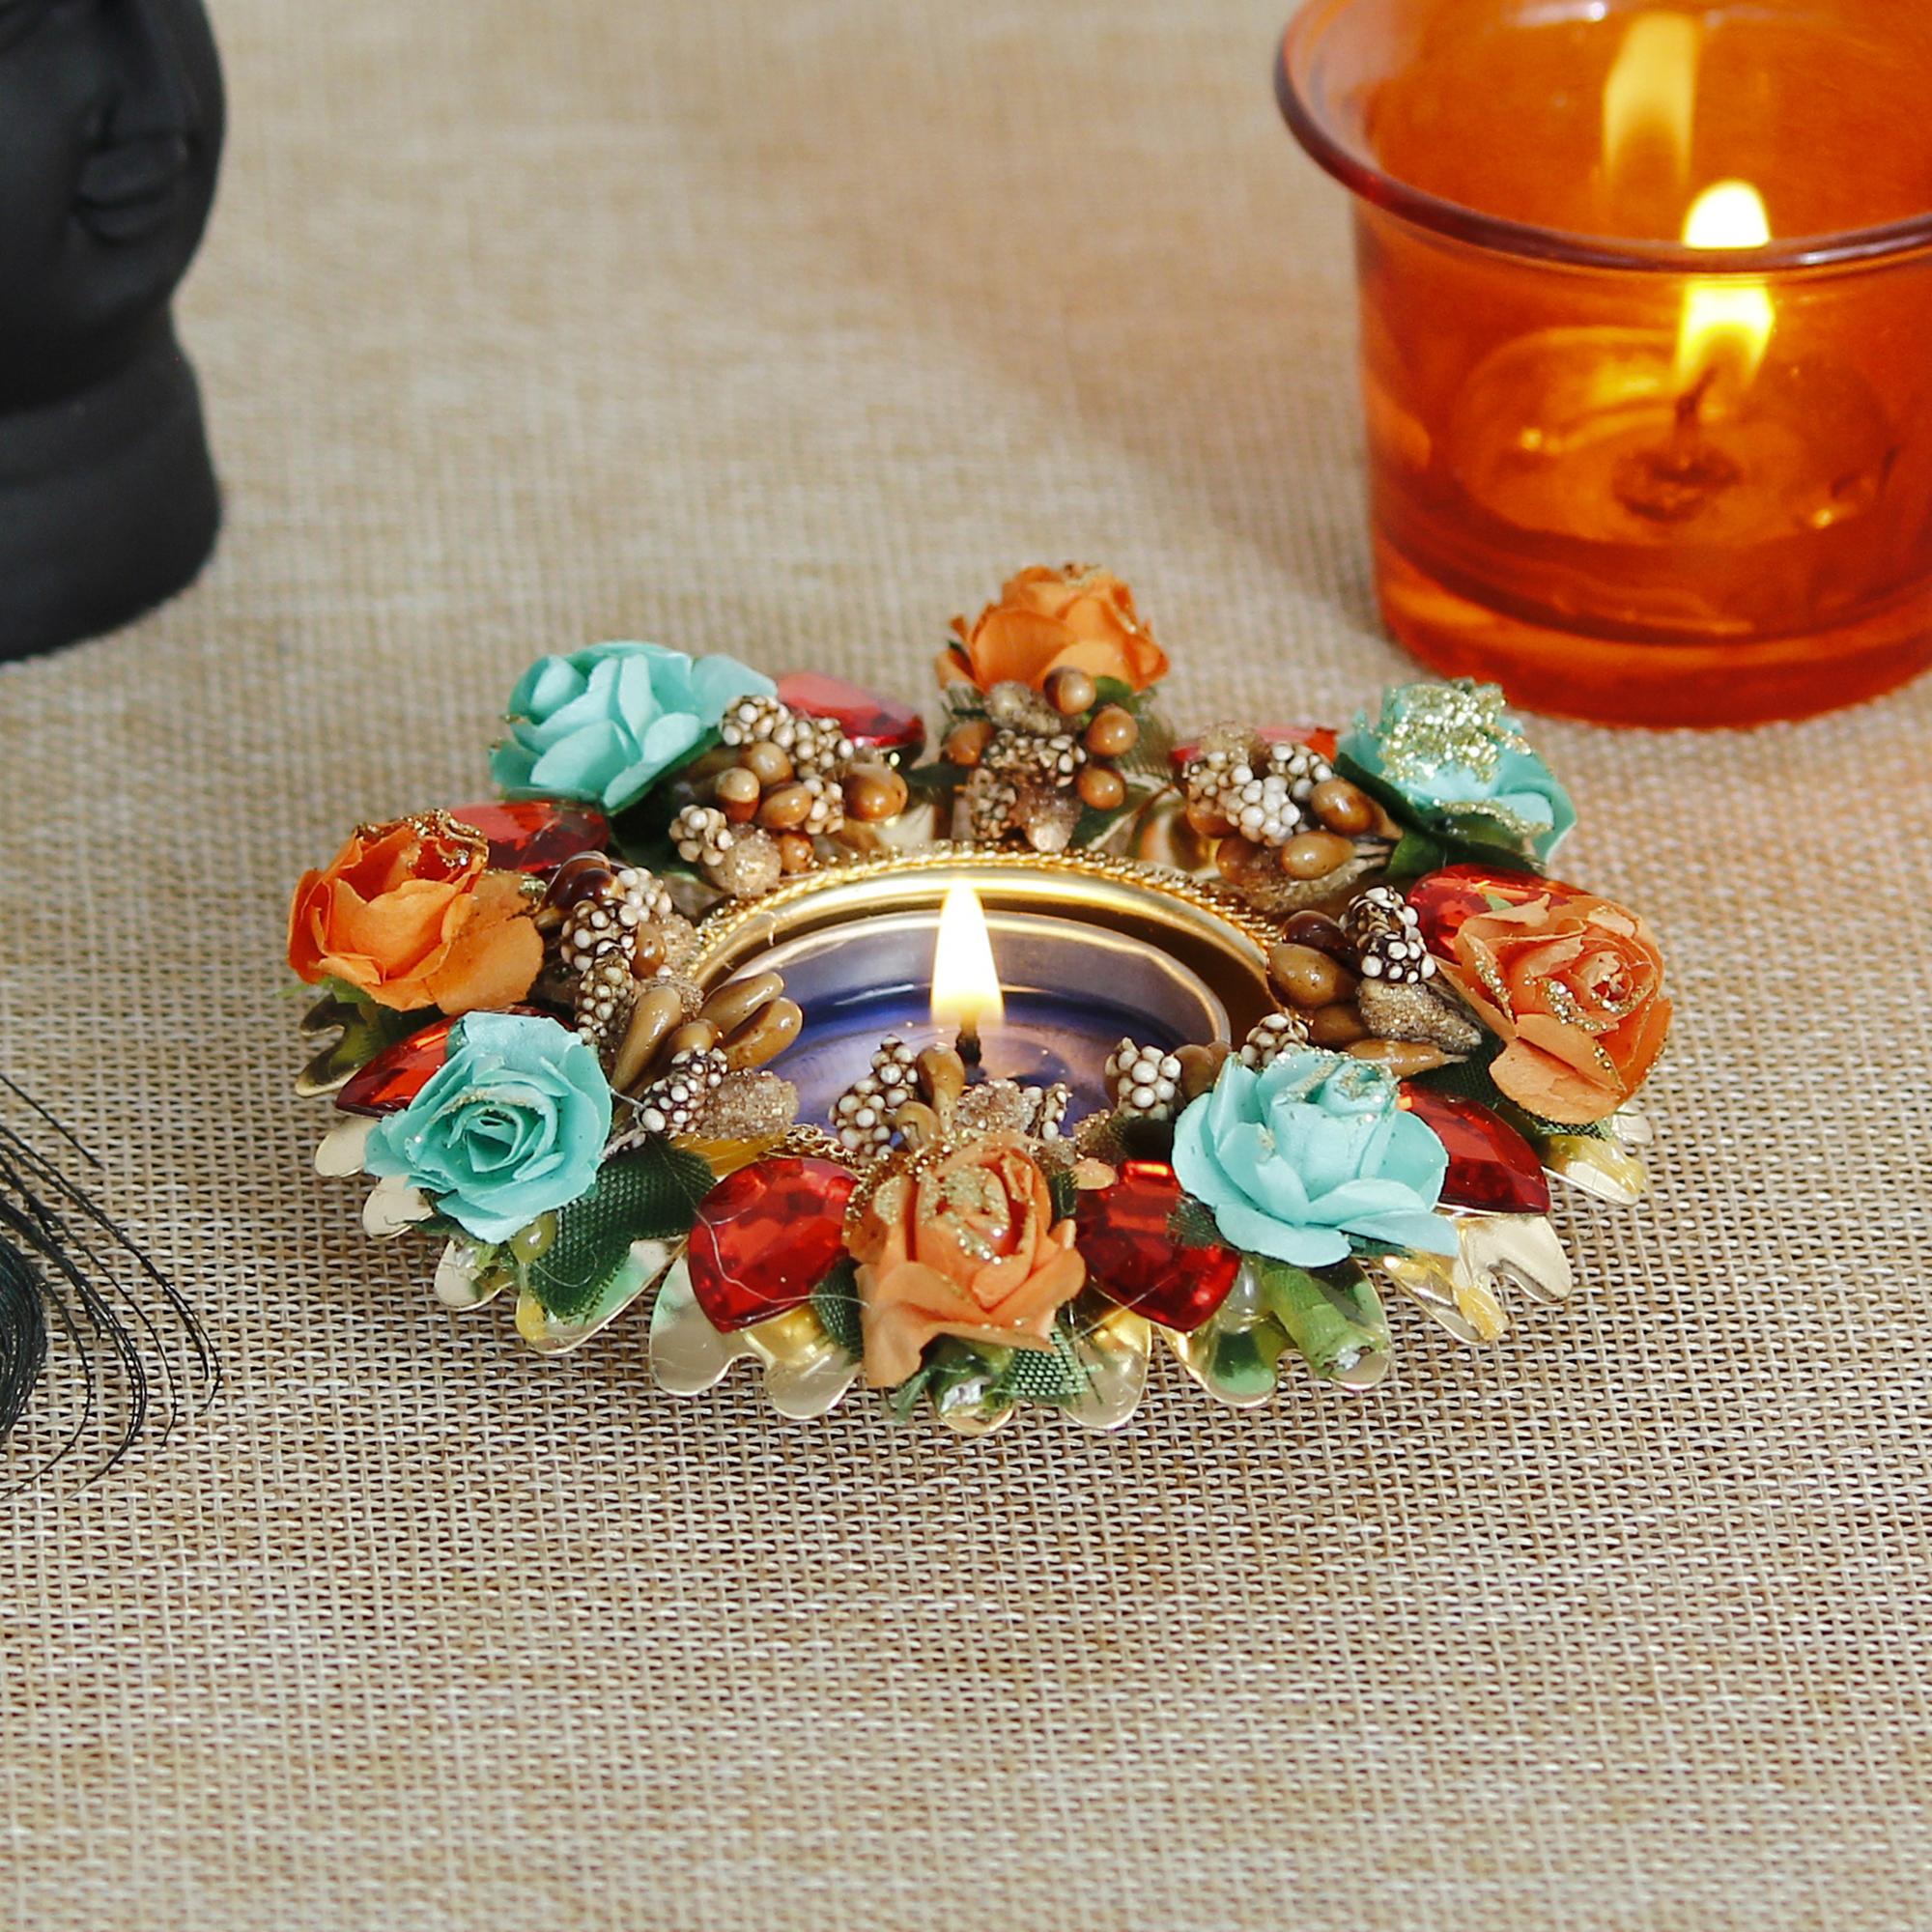 Decorative Handcrafted Stone Work Tea Light Holder Indian Home Decor